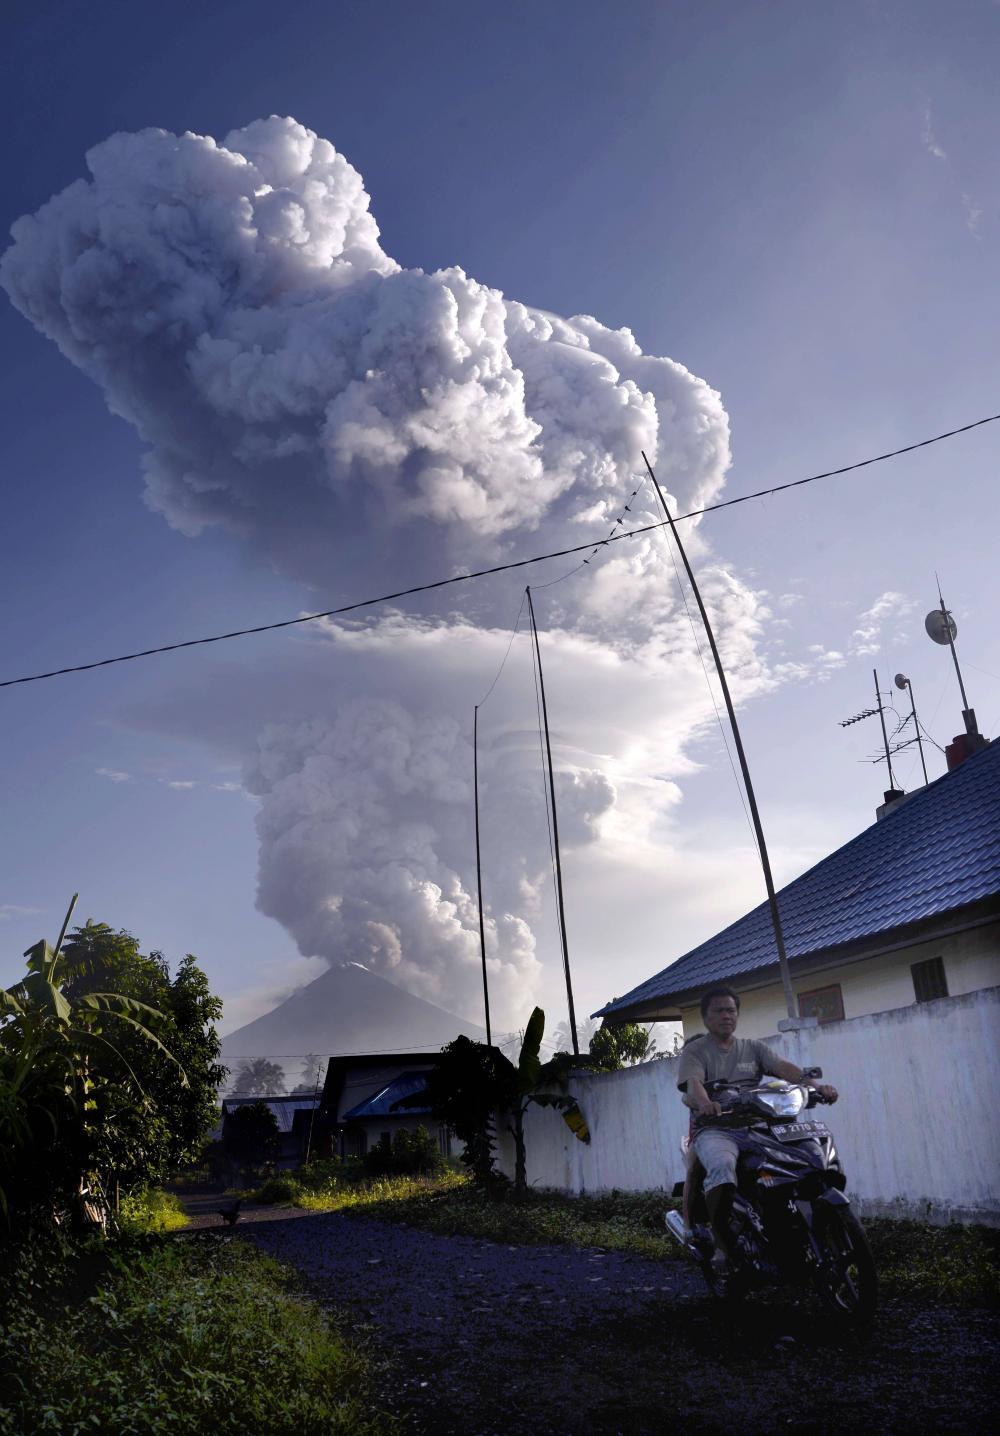 soputan volcano eruption, soputan volcano eruption pictures, soputan volcano eruption videos, soputan volcano eruption january 2016, soputan volcano eruption january 2016 pictures and videos